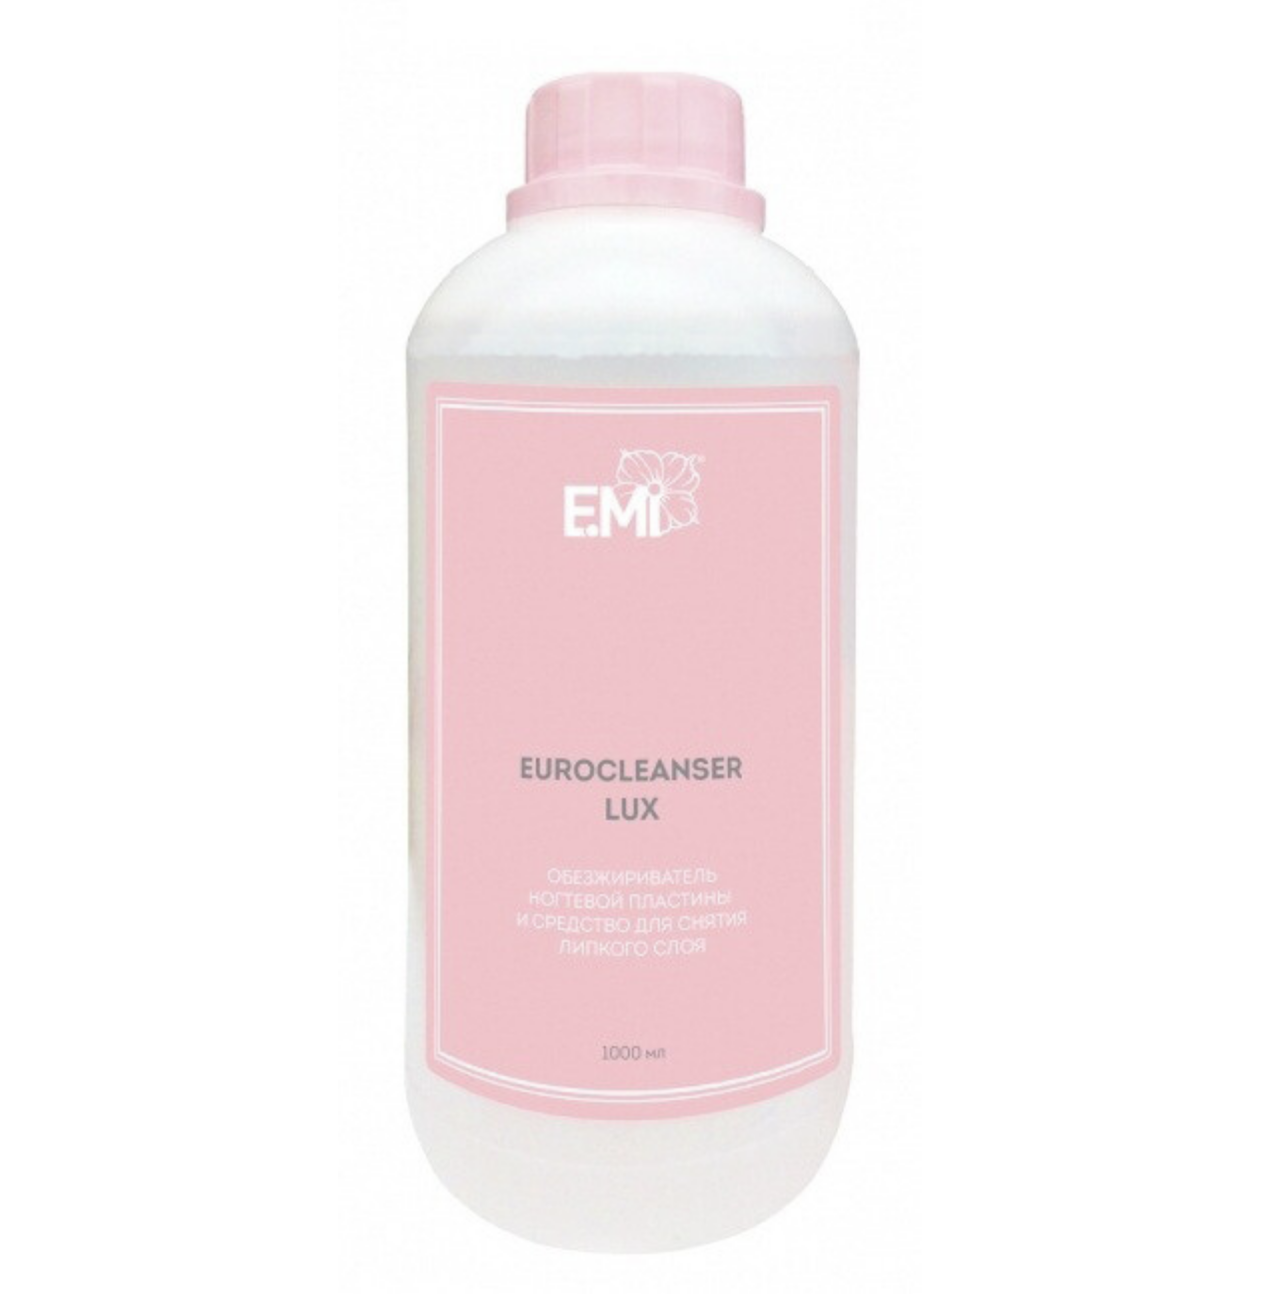 Eurocleanser, 200/1000 ml